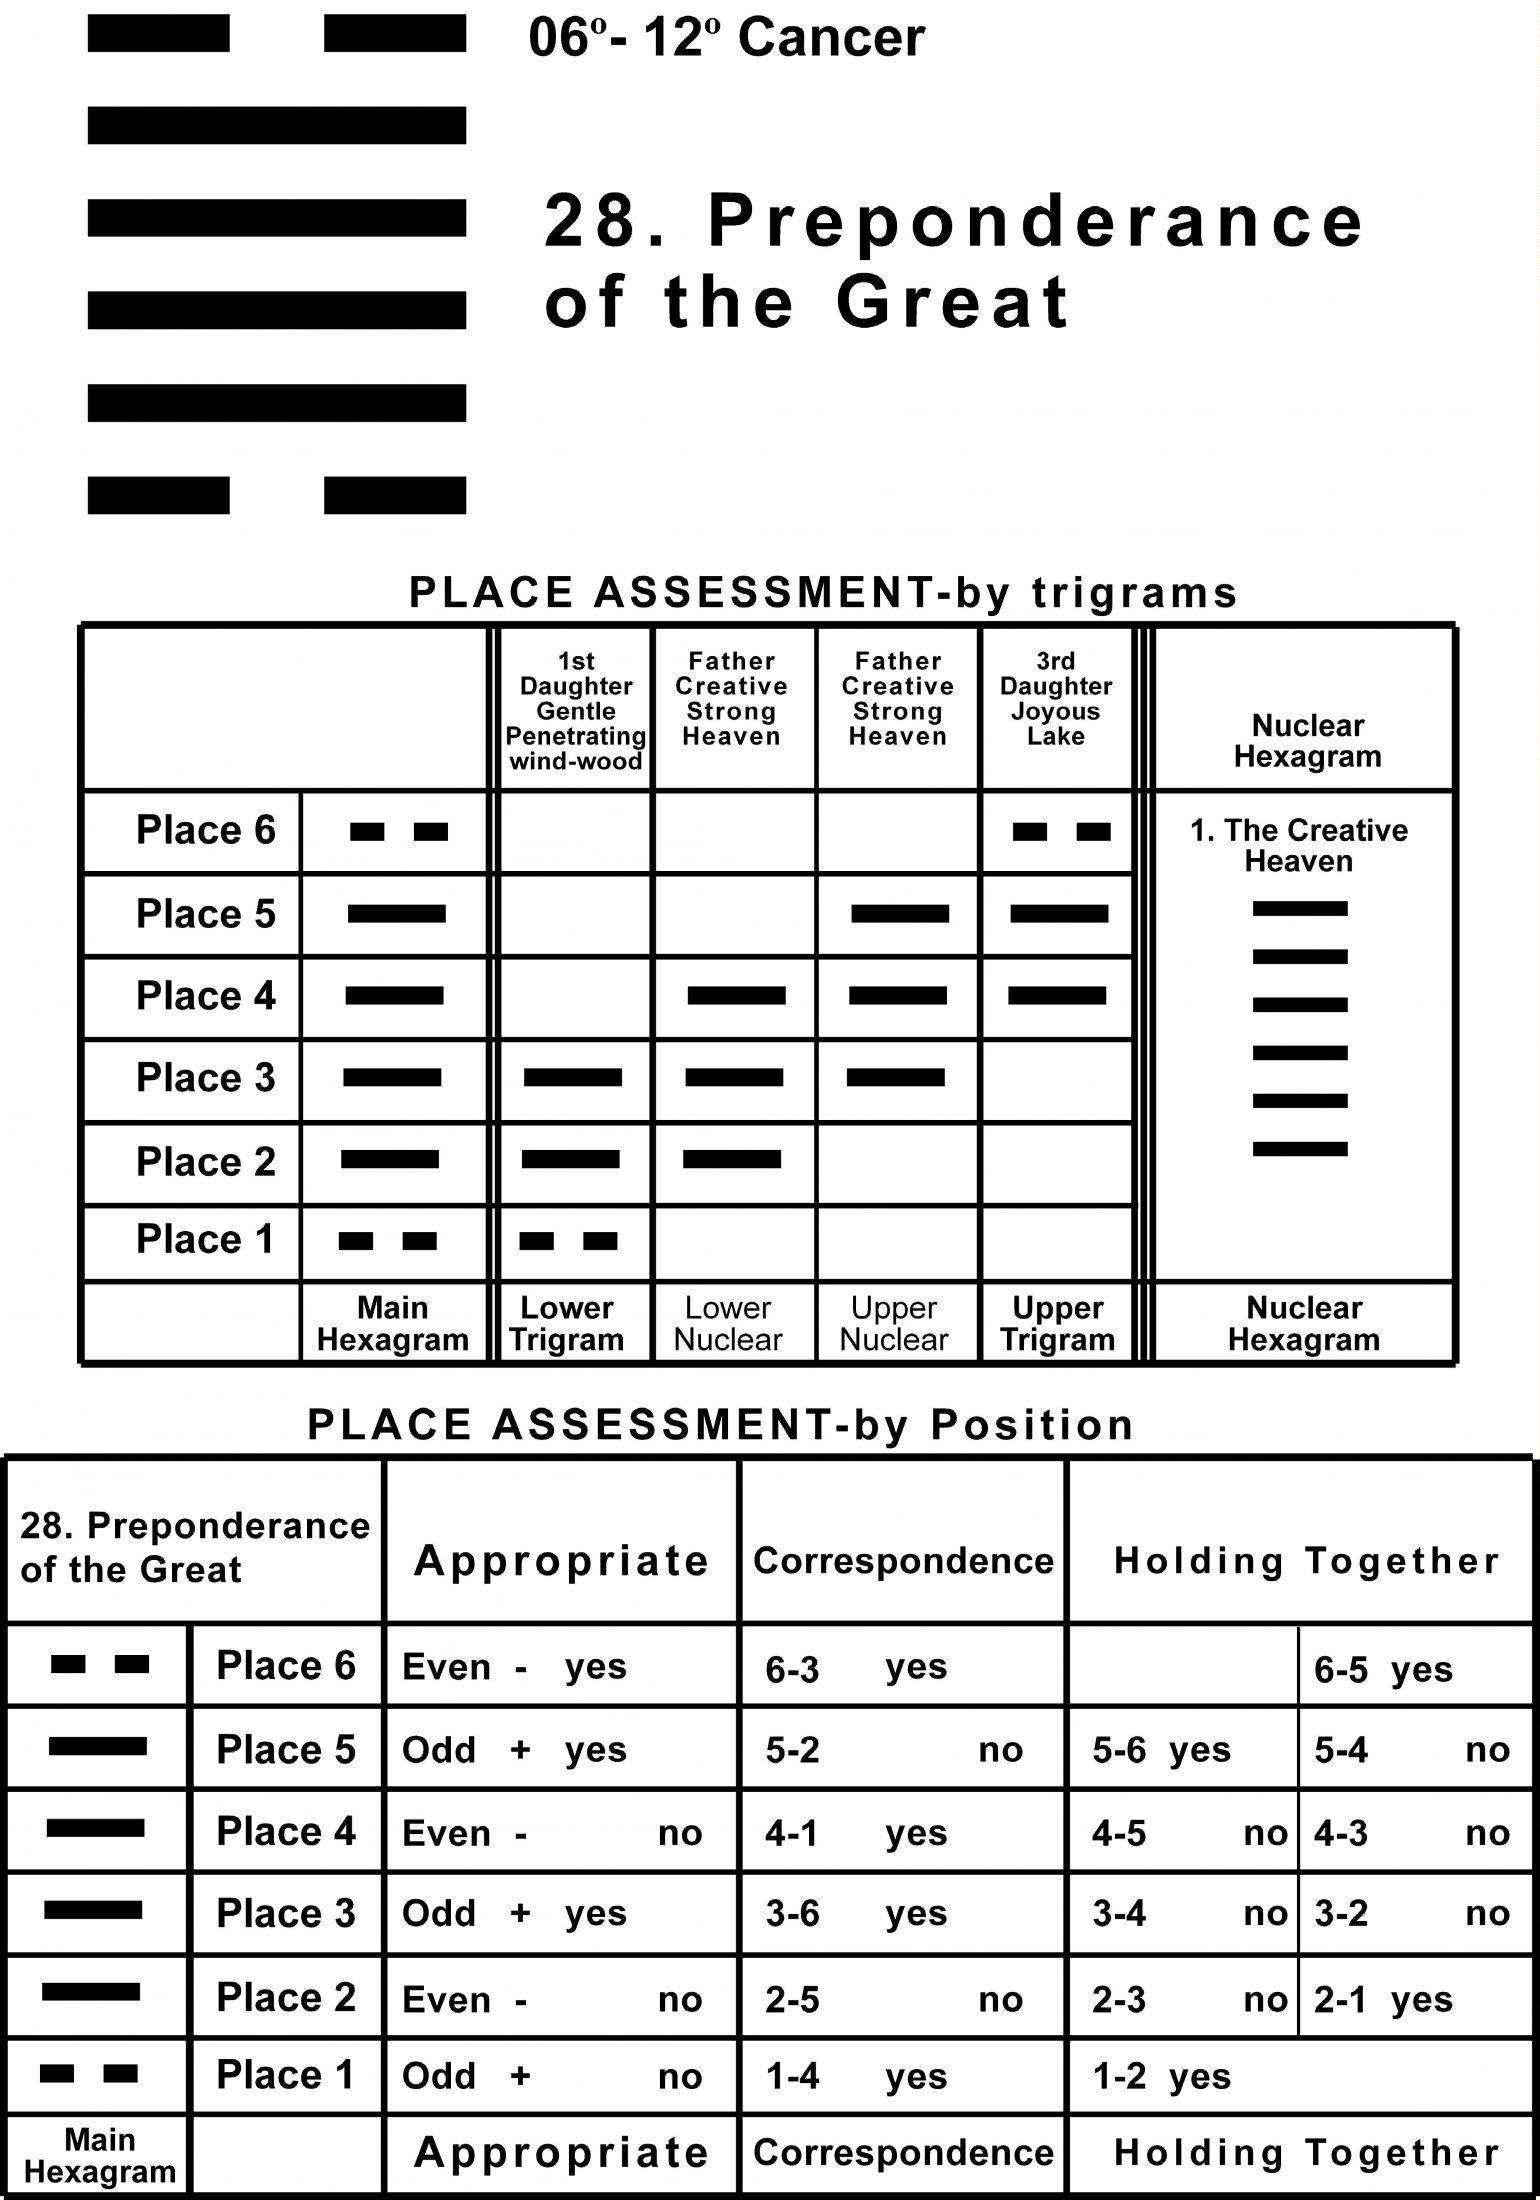 Places-04CN 06-12 Hx-28 Preponderance Great